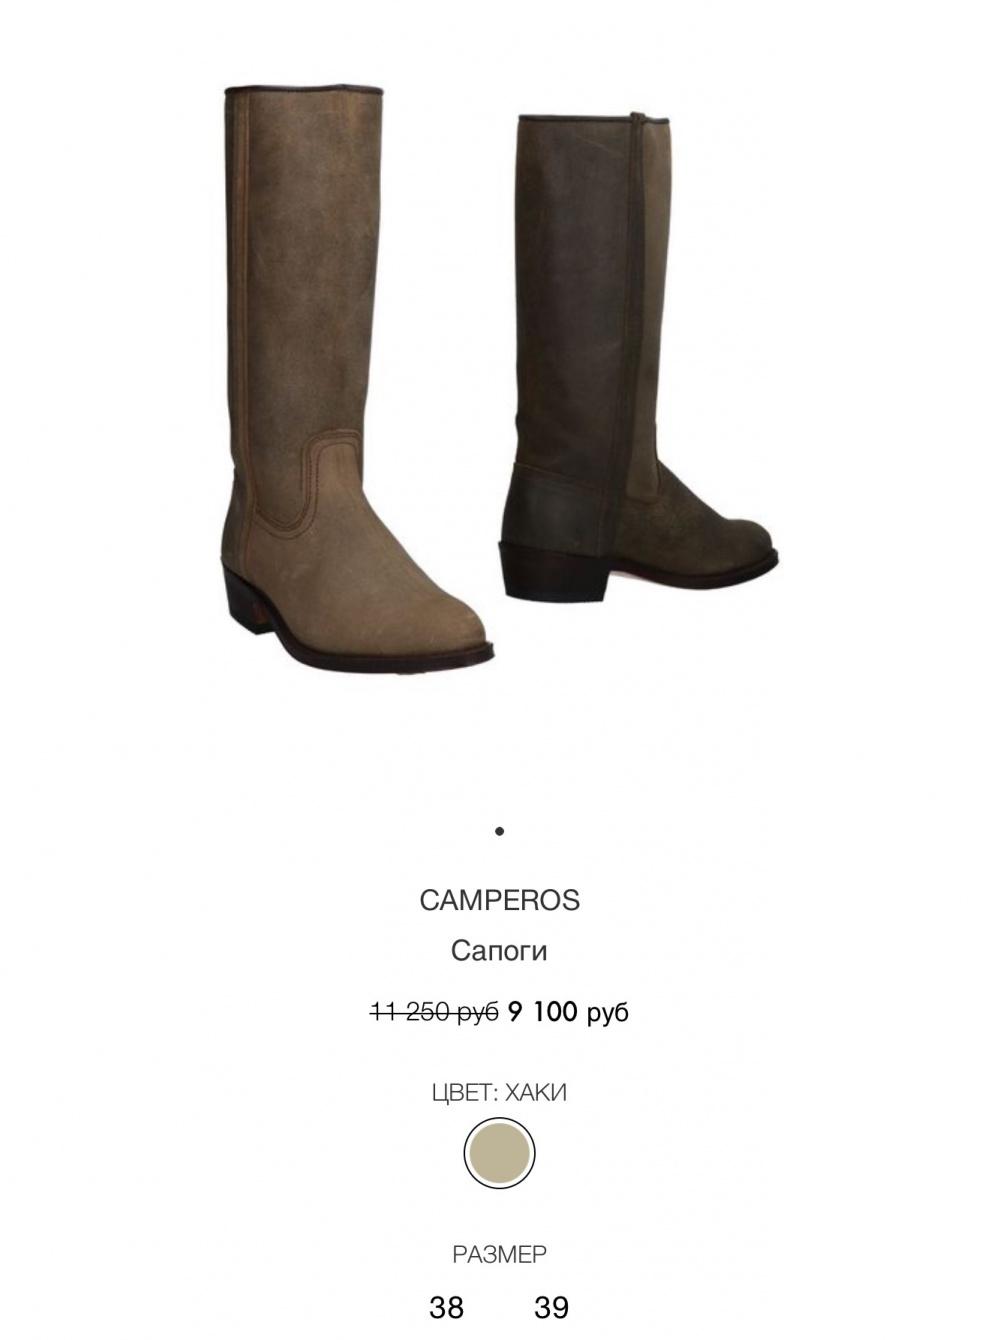 Сапоги казаки Camperos, размер 40-41